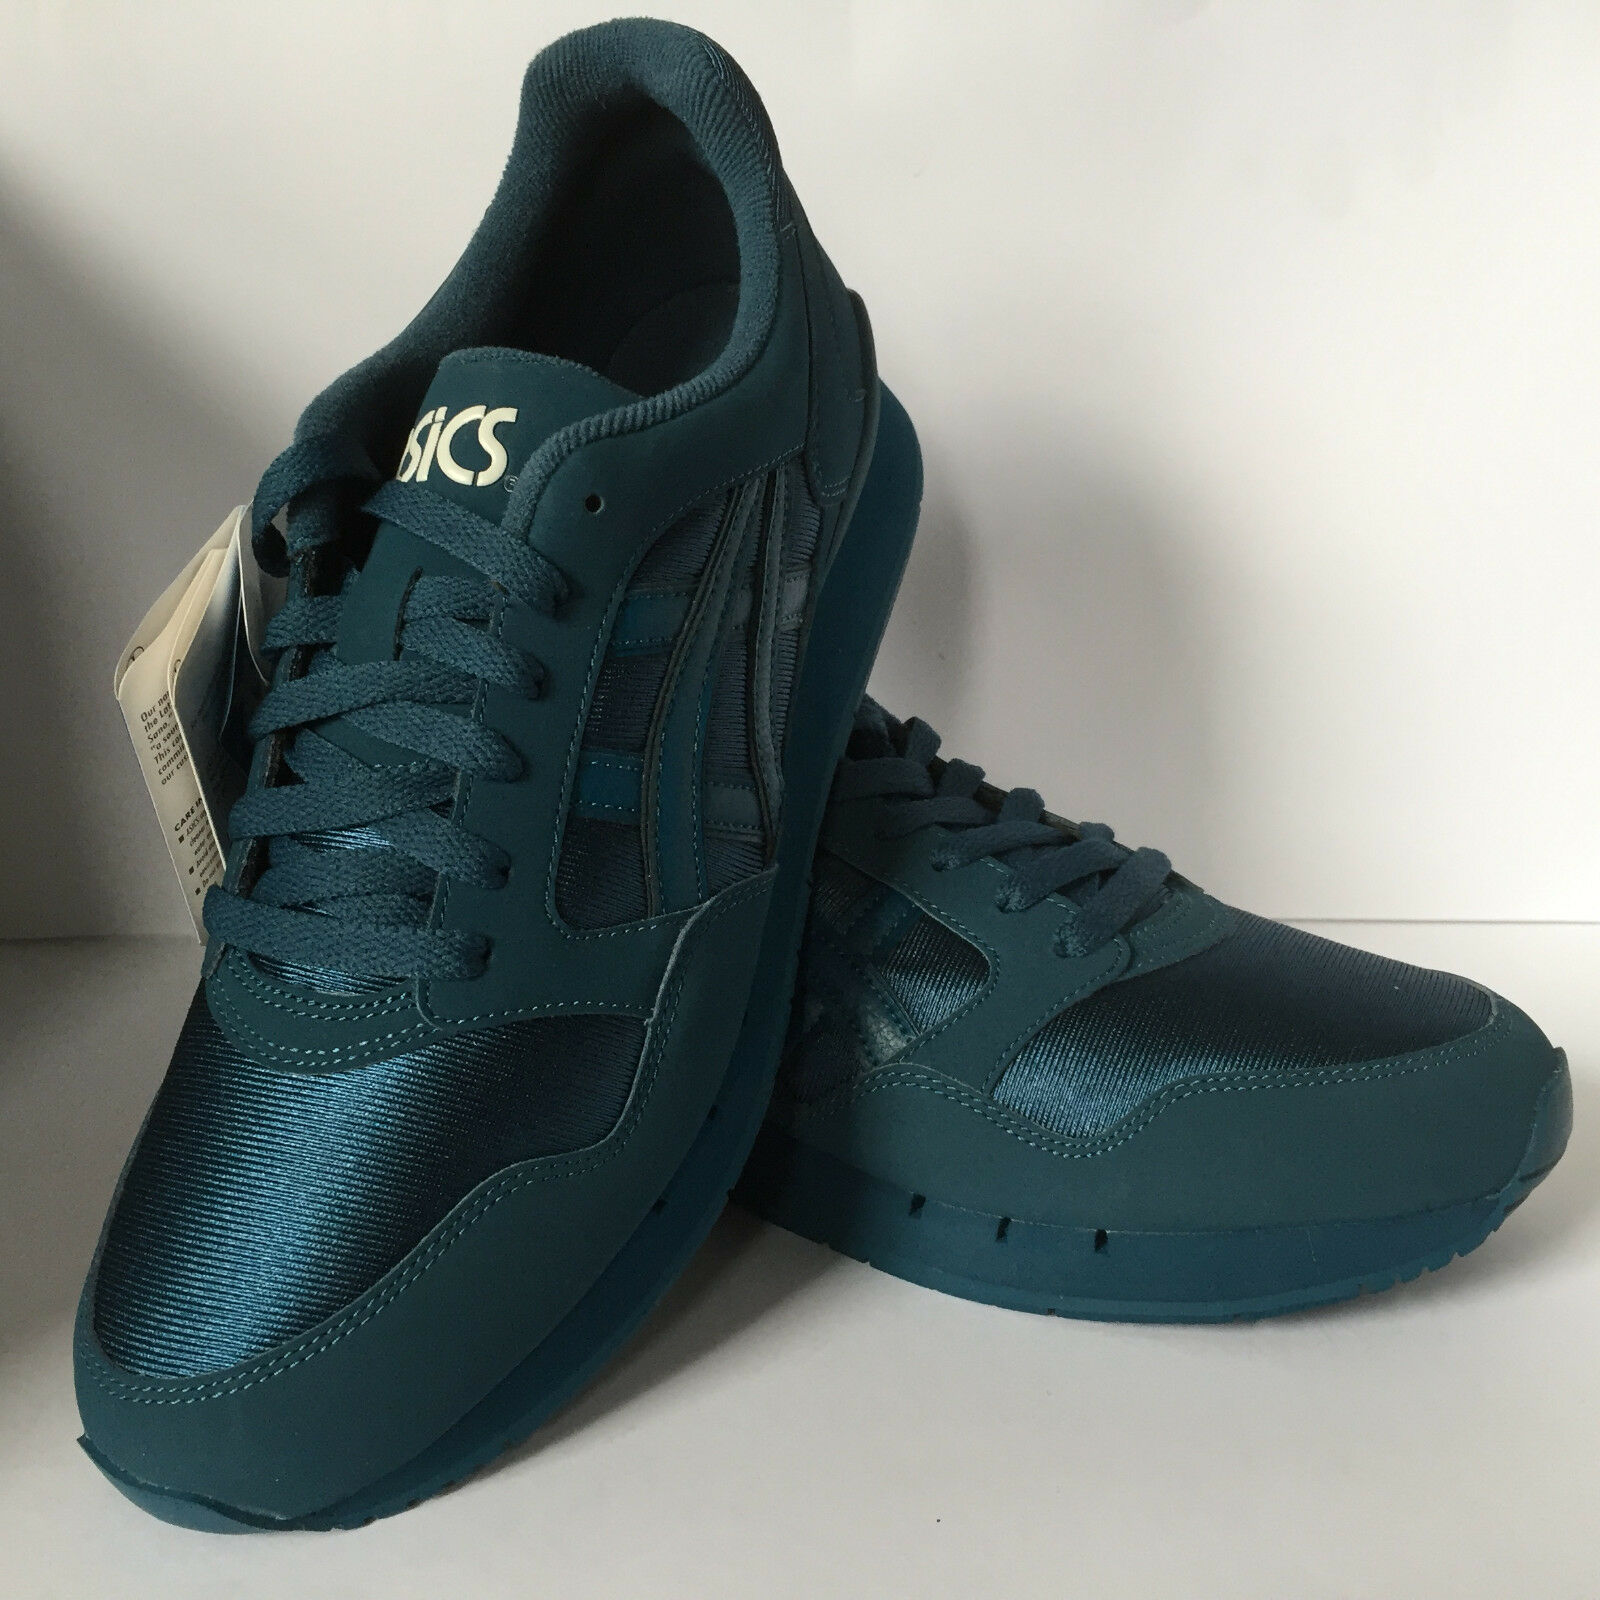 Asics Gel Atlanis Mens Classic Runner Legion Blau New